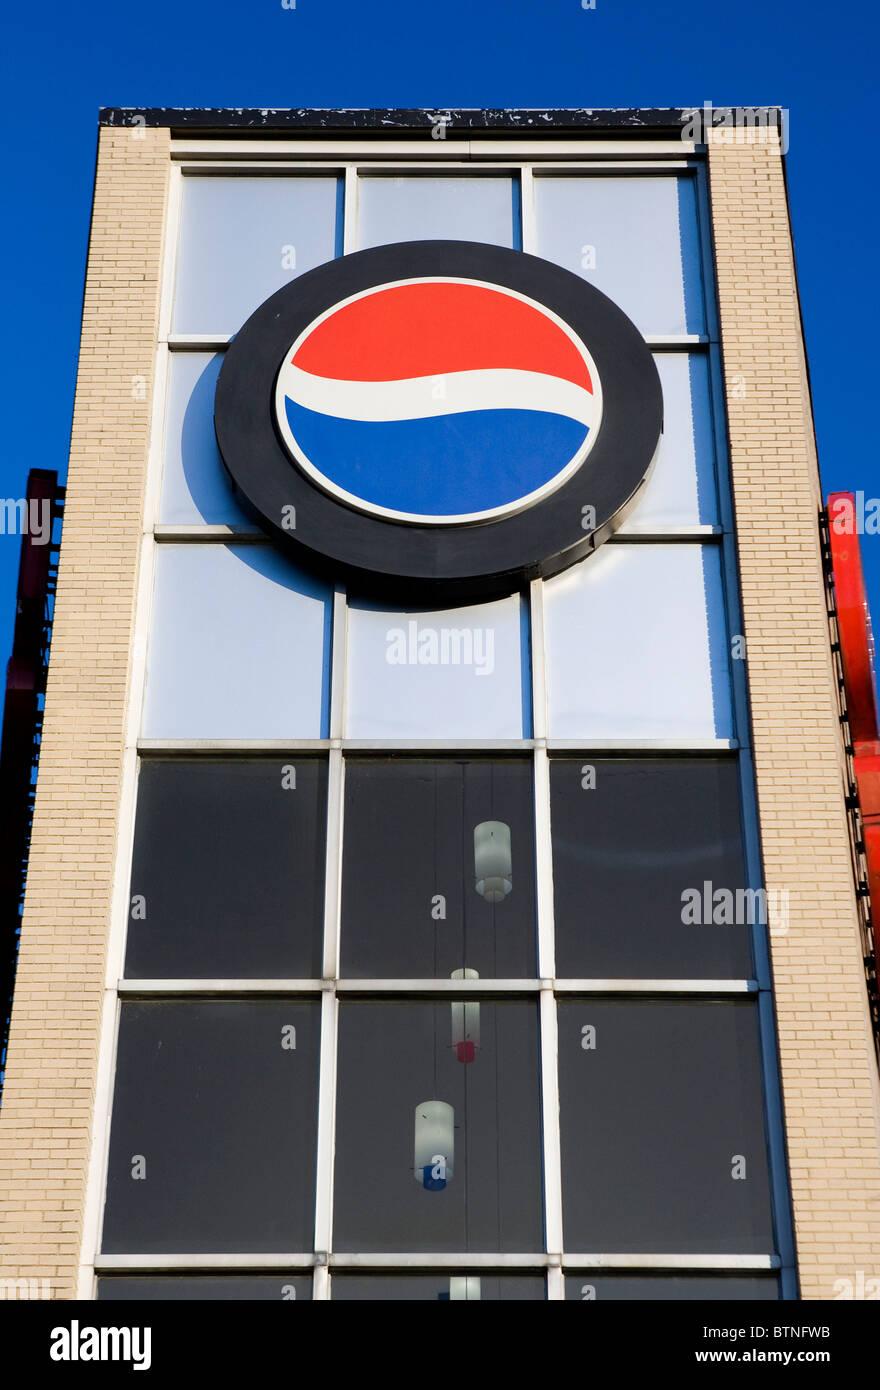 Cola Plant Stock Photos & Cola Plant Stock Images - Alamy